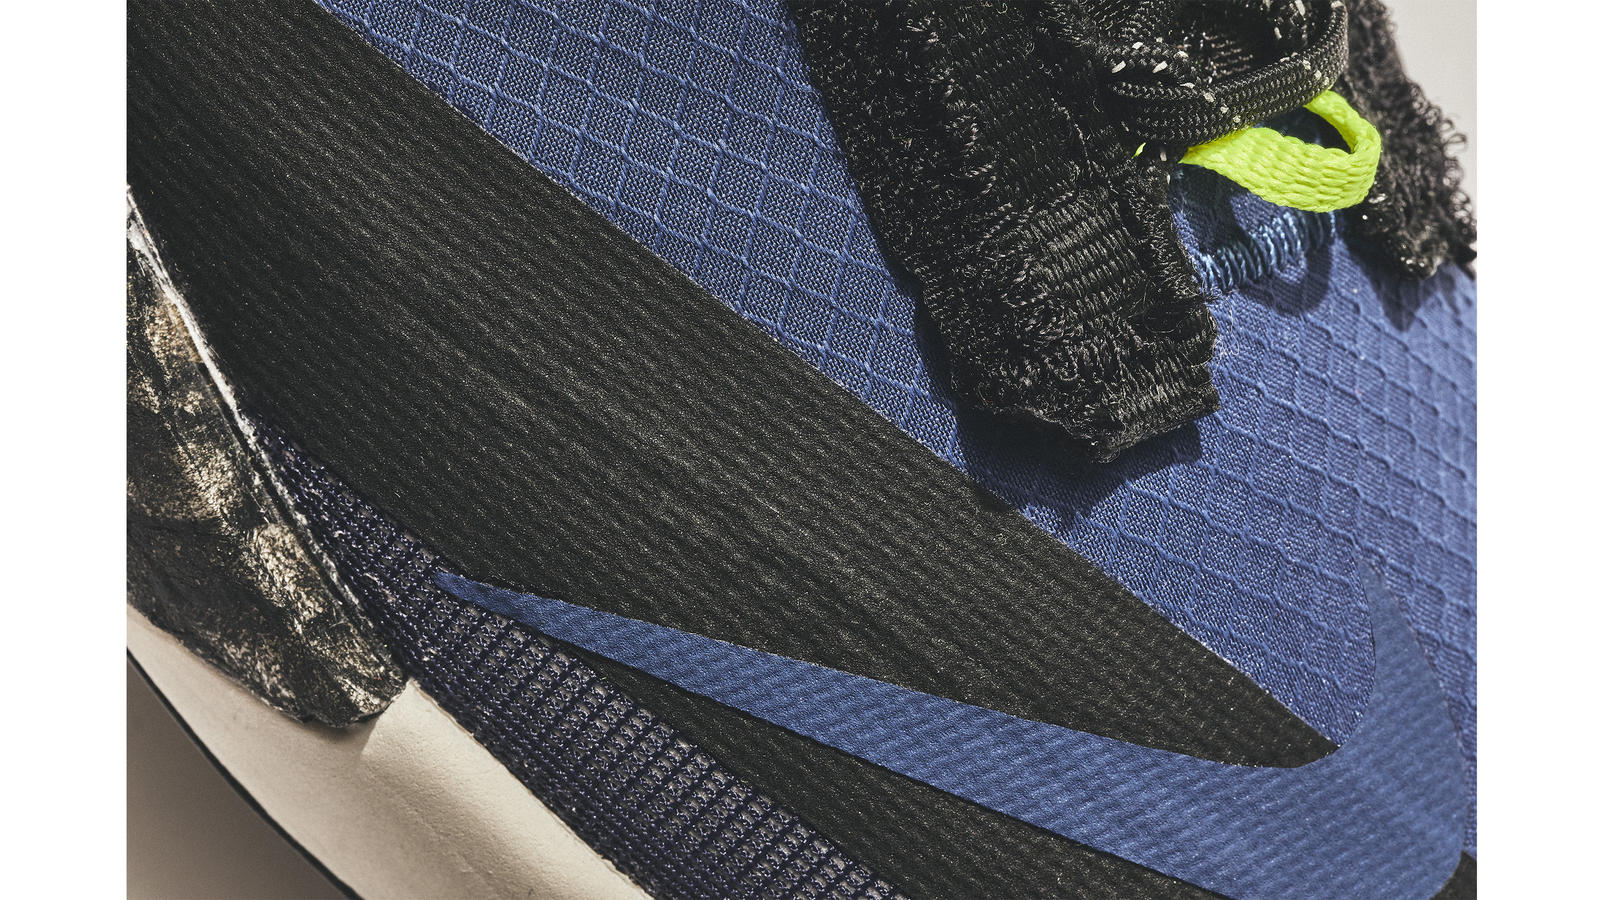 Nike ISPA Drifter Gator 15